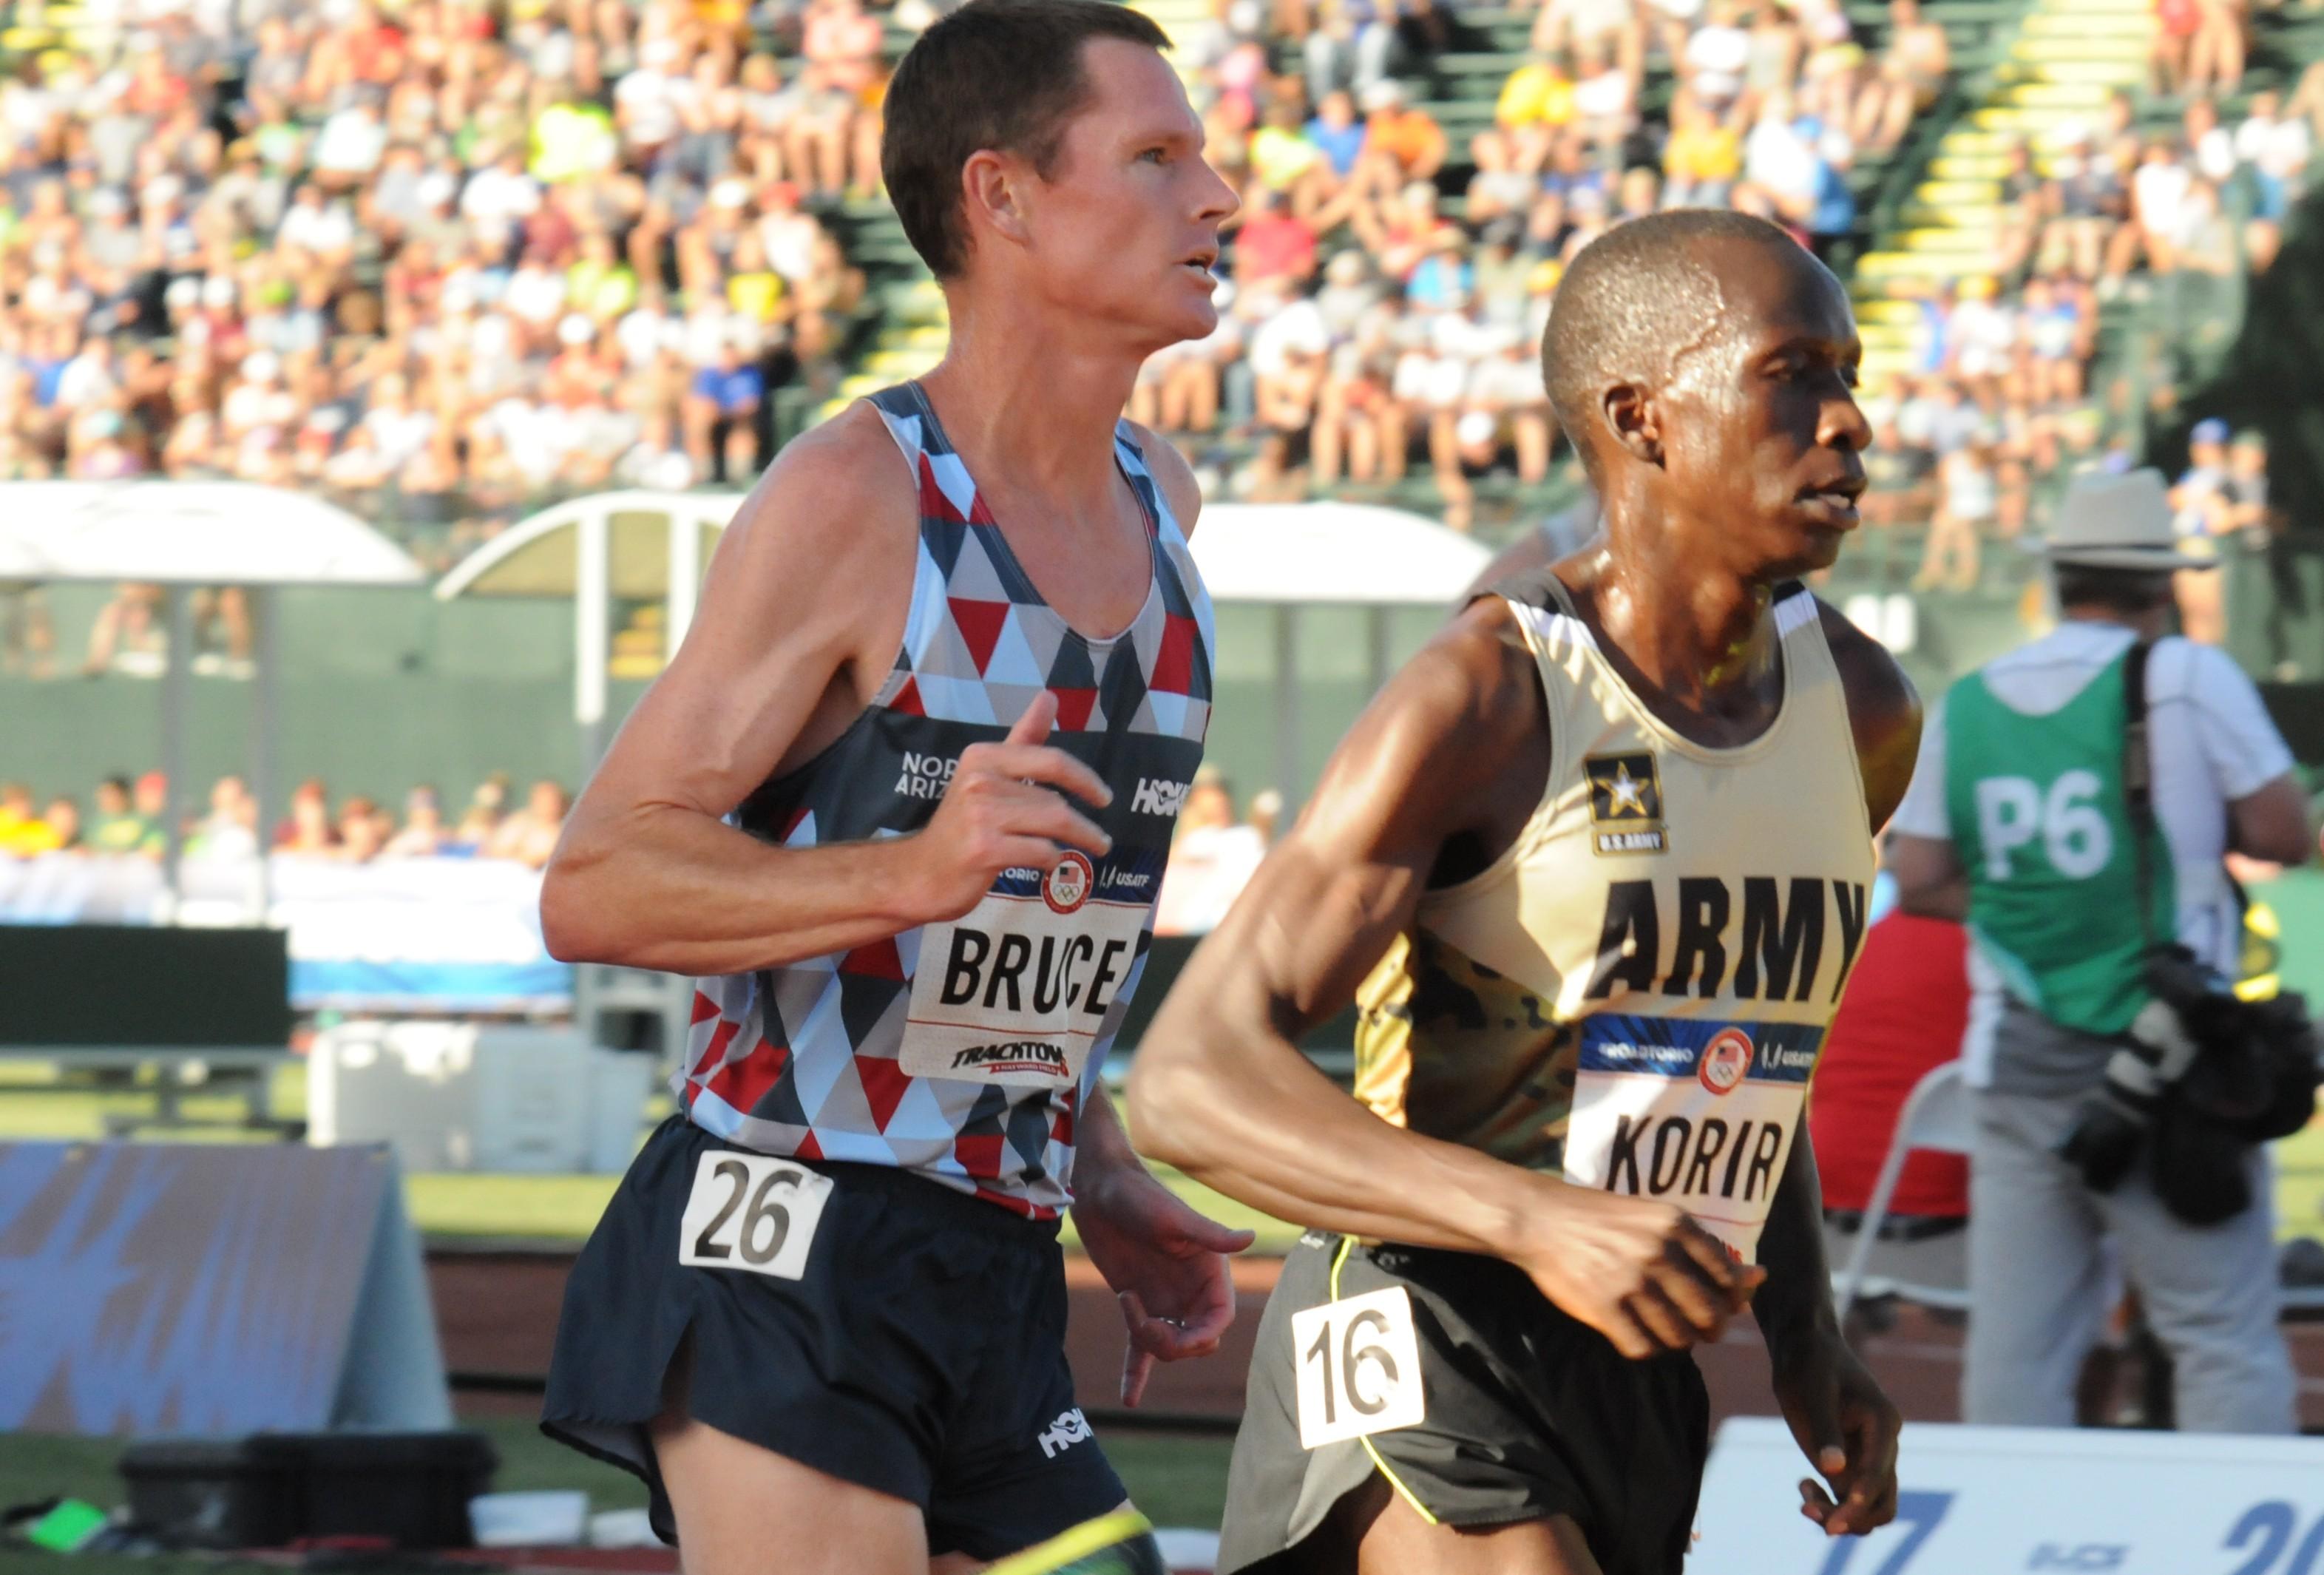 Leonard Korir olympics